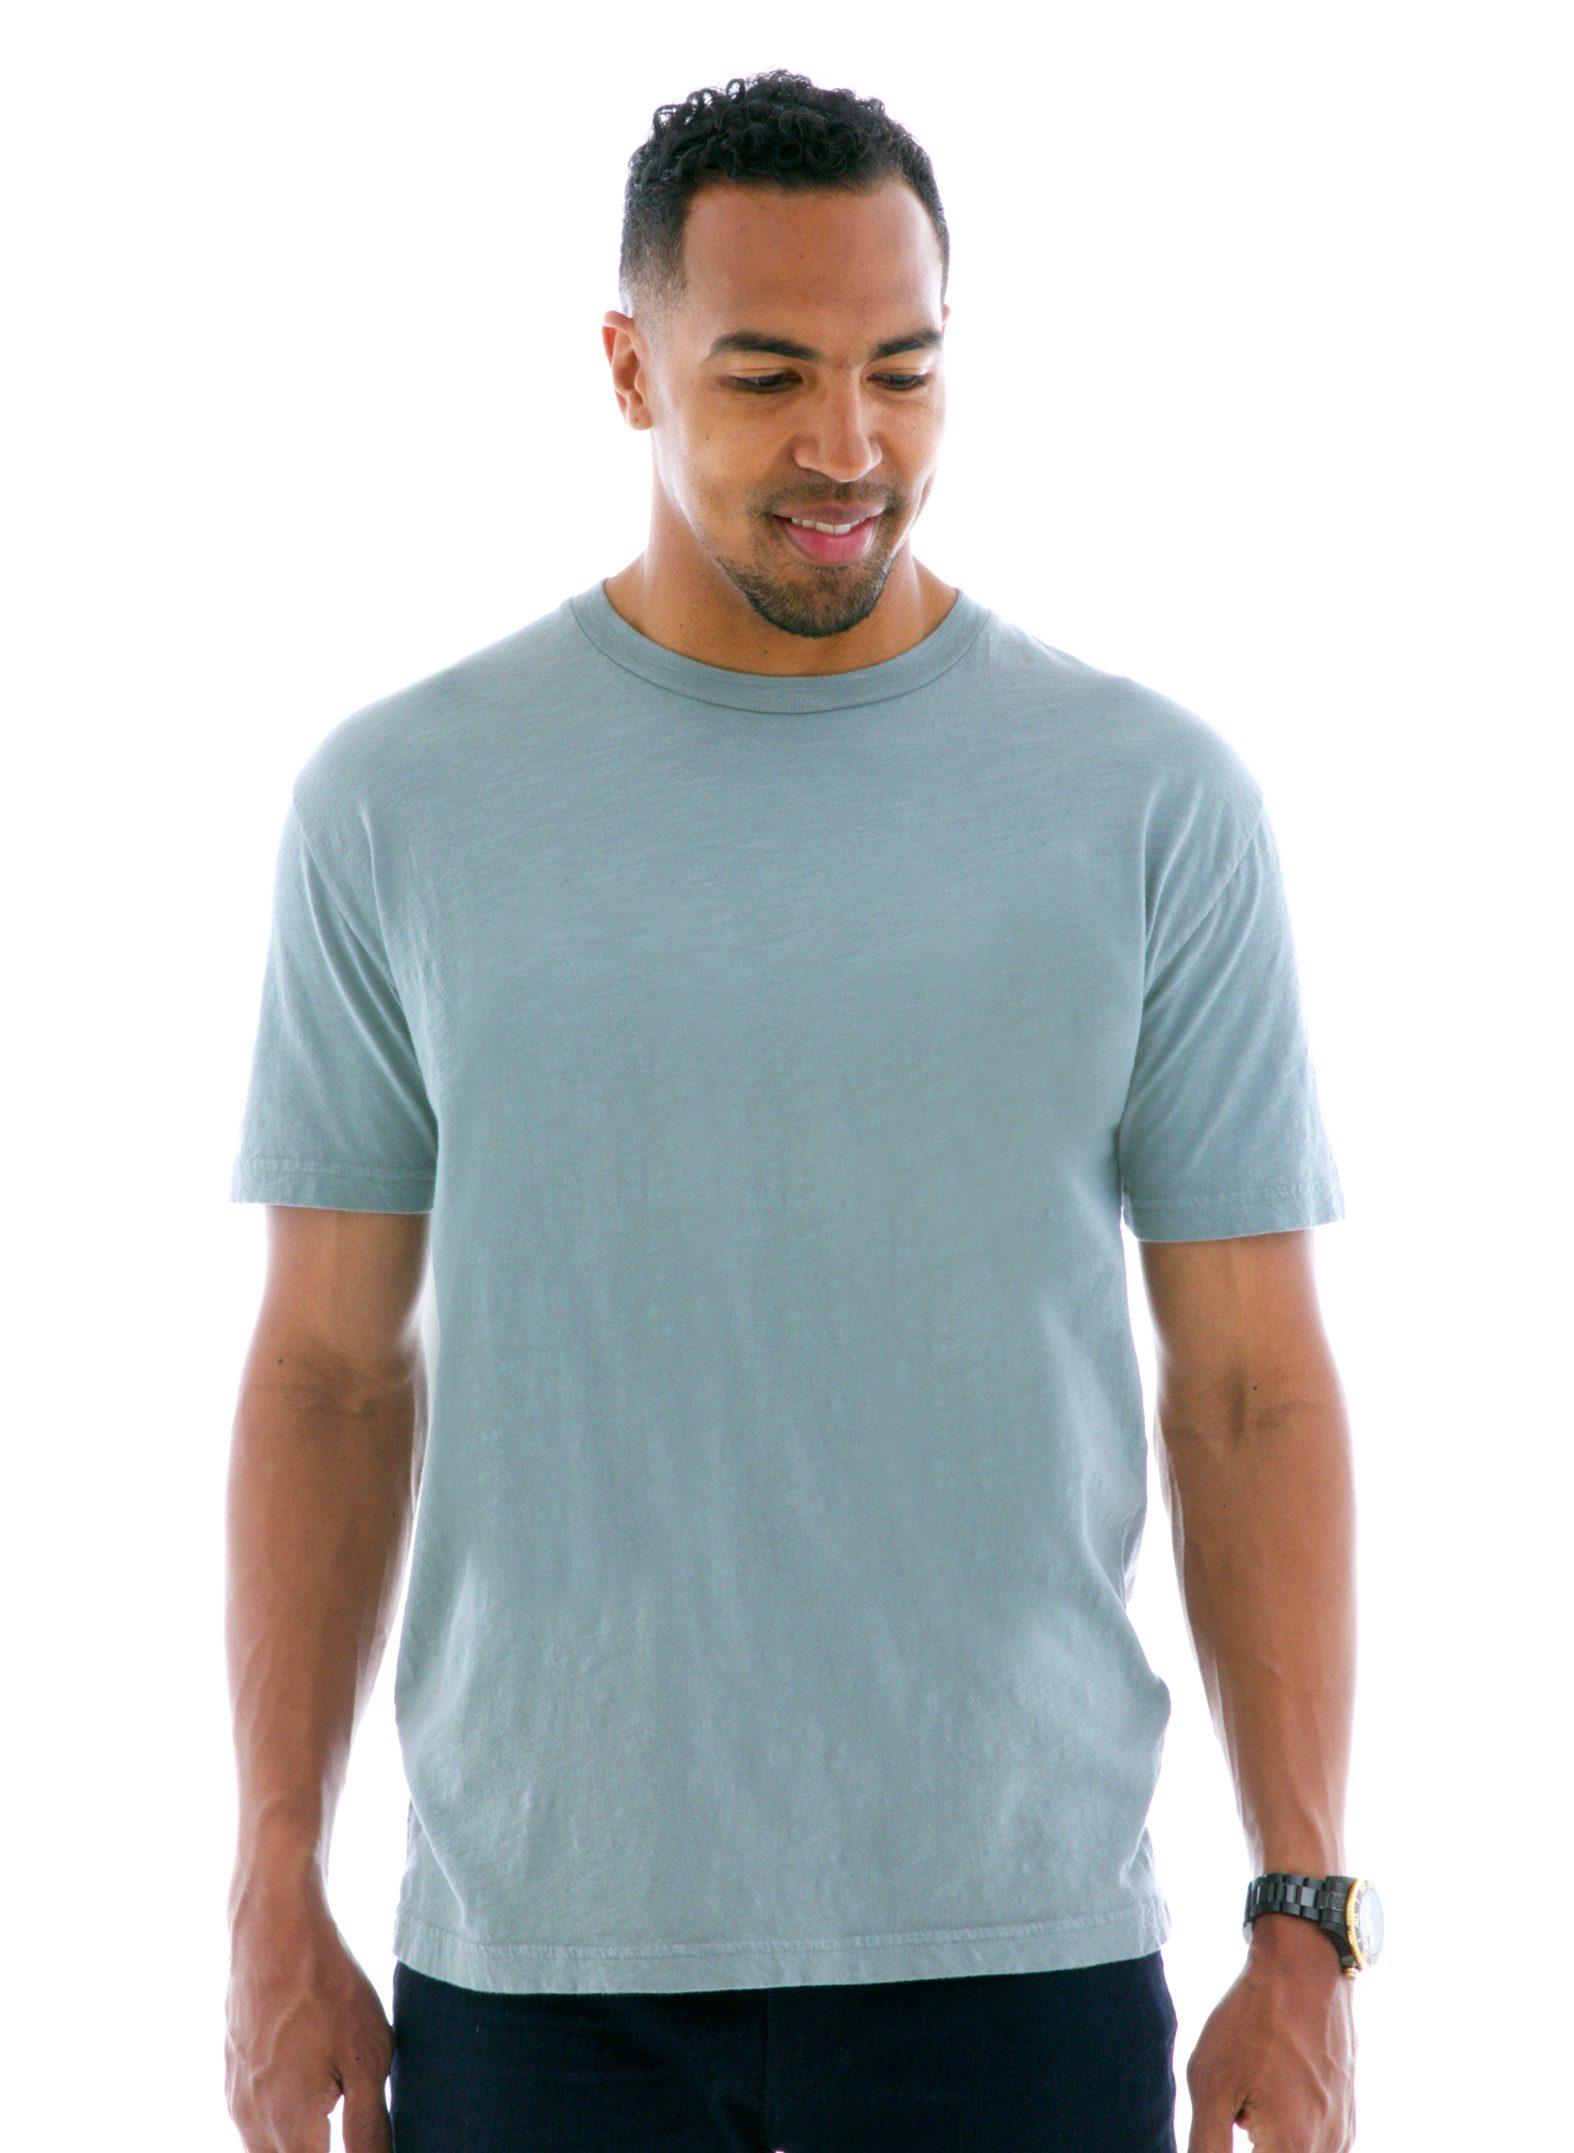 Slub Jersey Short Sleeve T-Shirt Front View